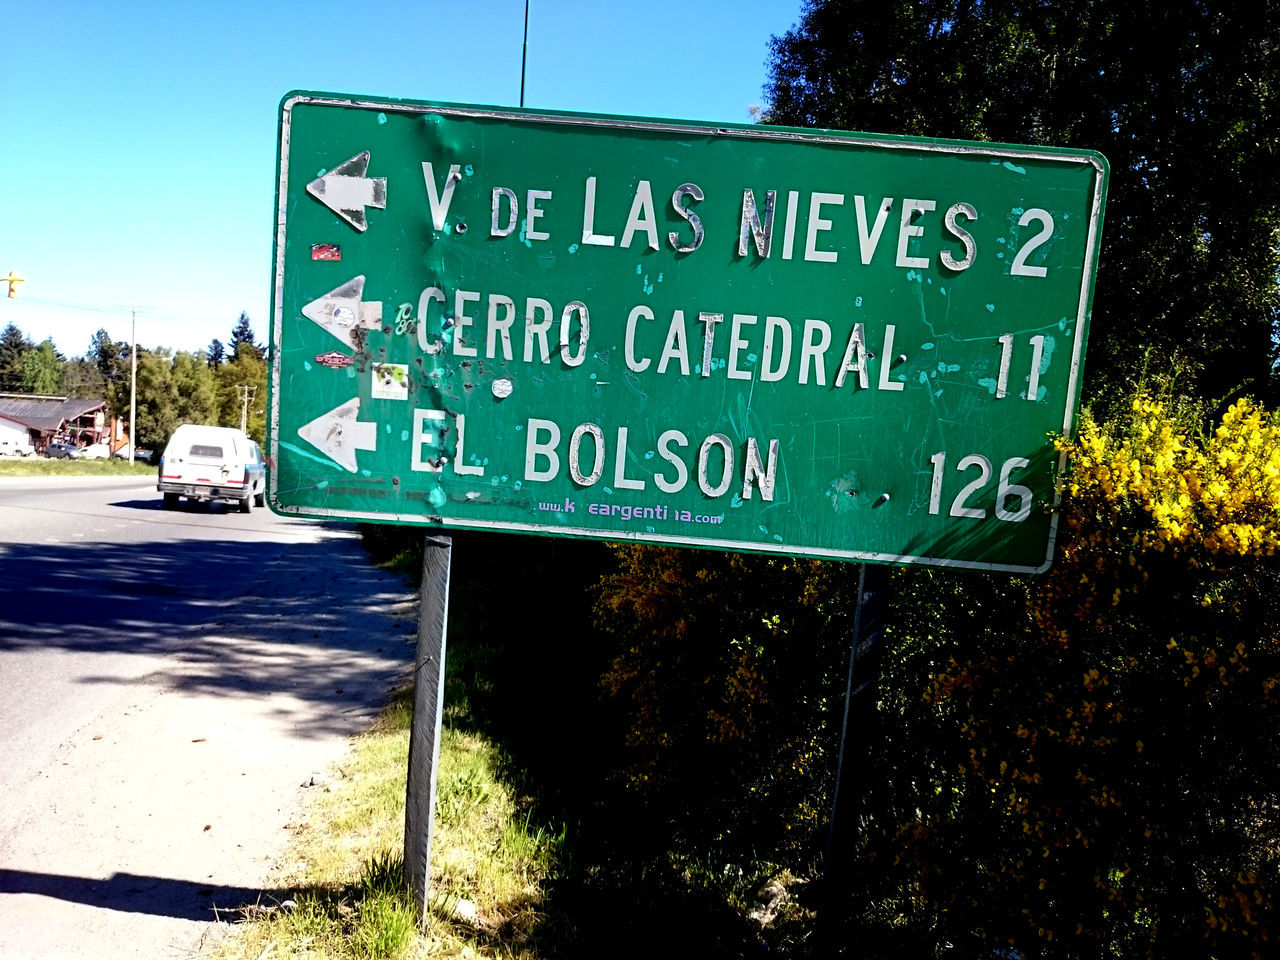 Cartel. Road Sign. Bariloche, Argentina El Bolson Llao Llao Sony Xperia Z2 Transit Argentina Bariloche Cerro Catedral Green Color Mobile Photography No People Road Sign